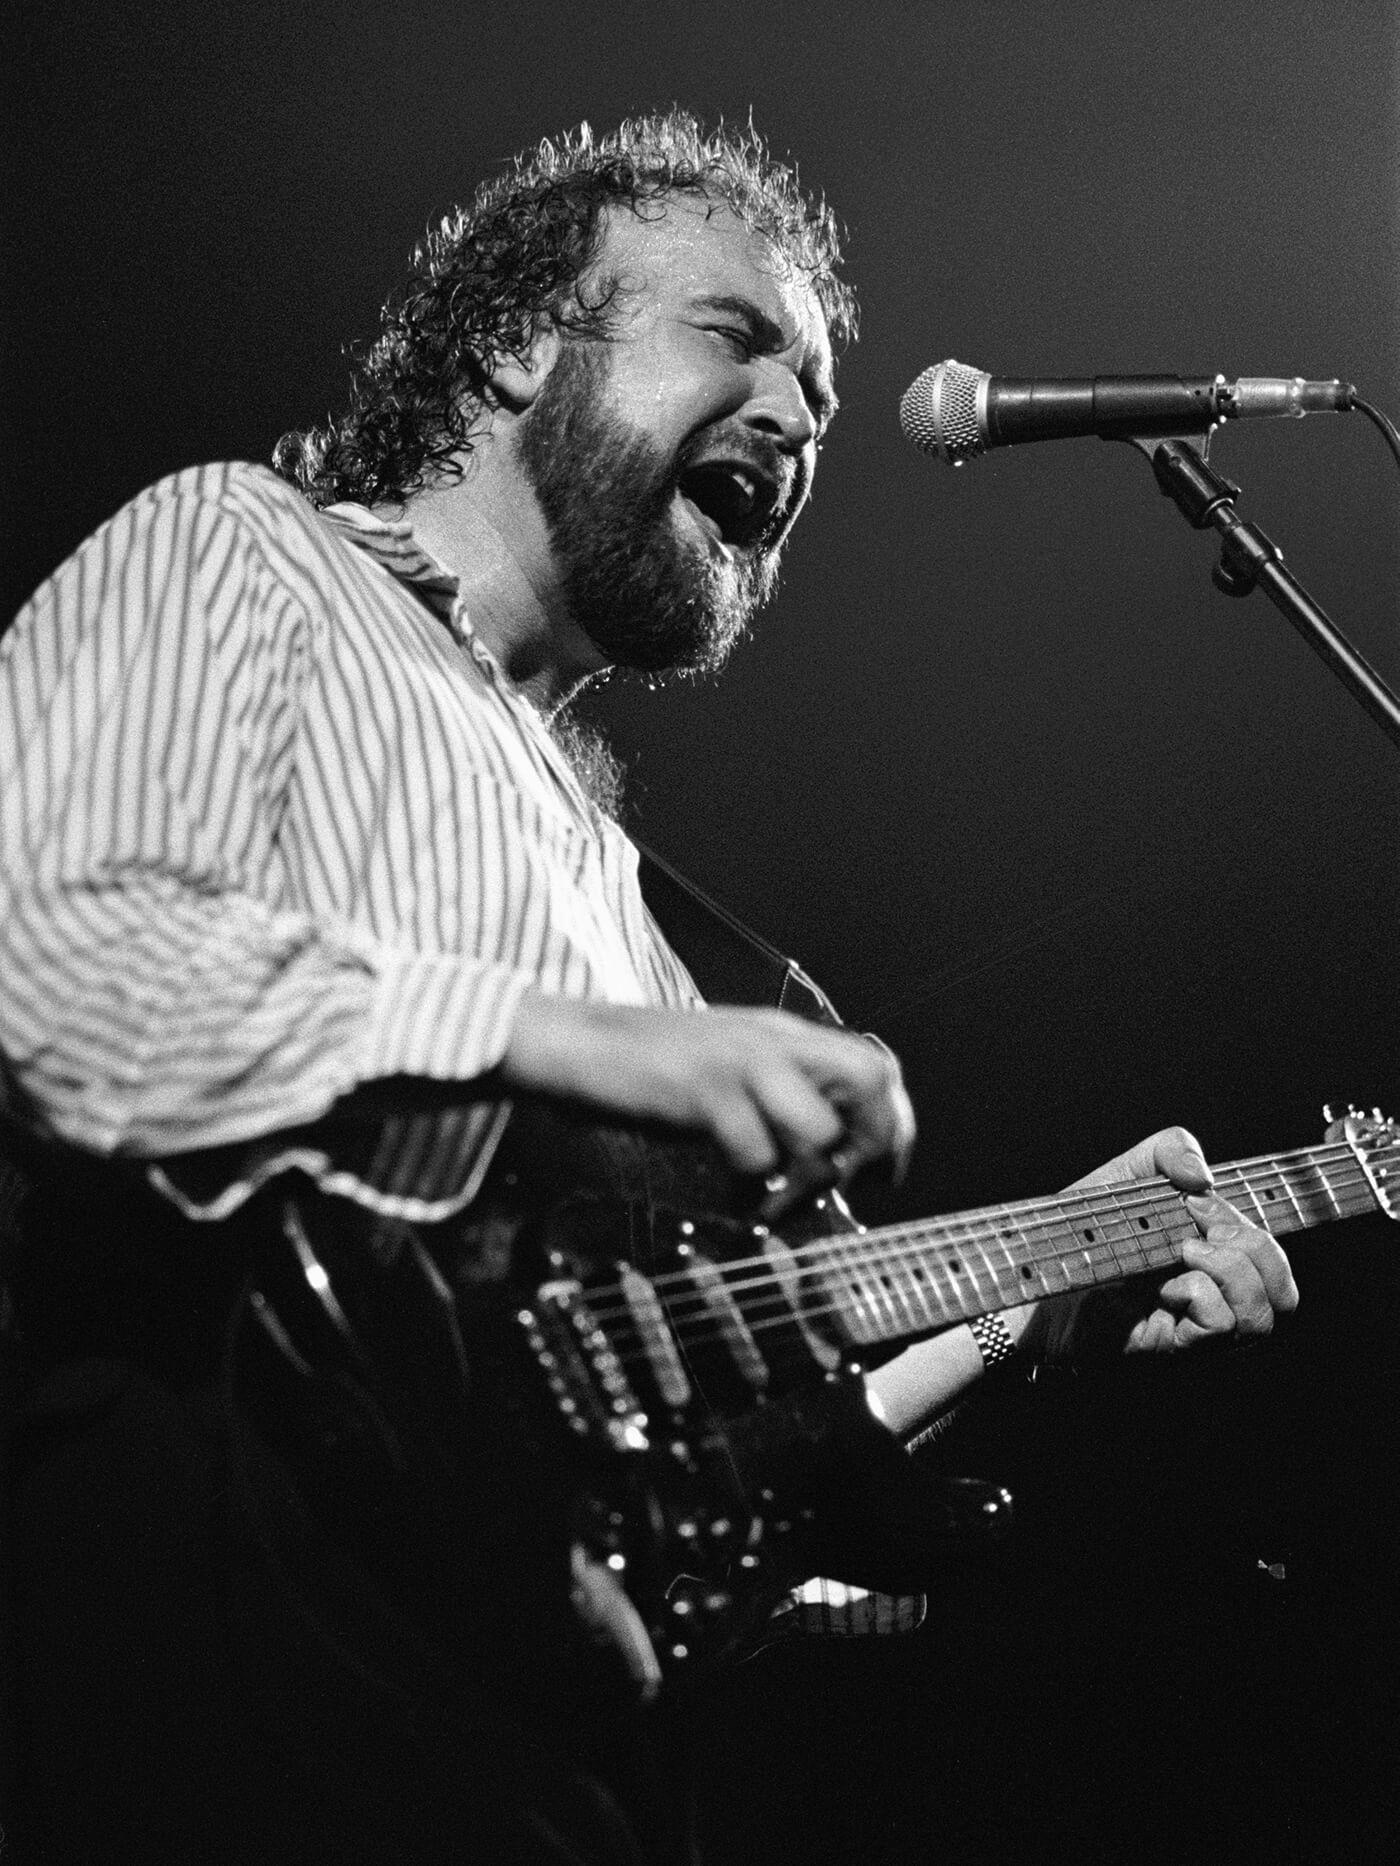 john martyn electric guitar